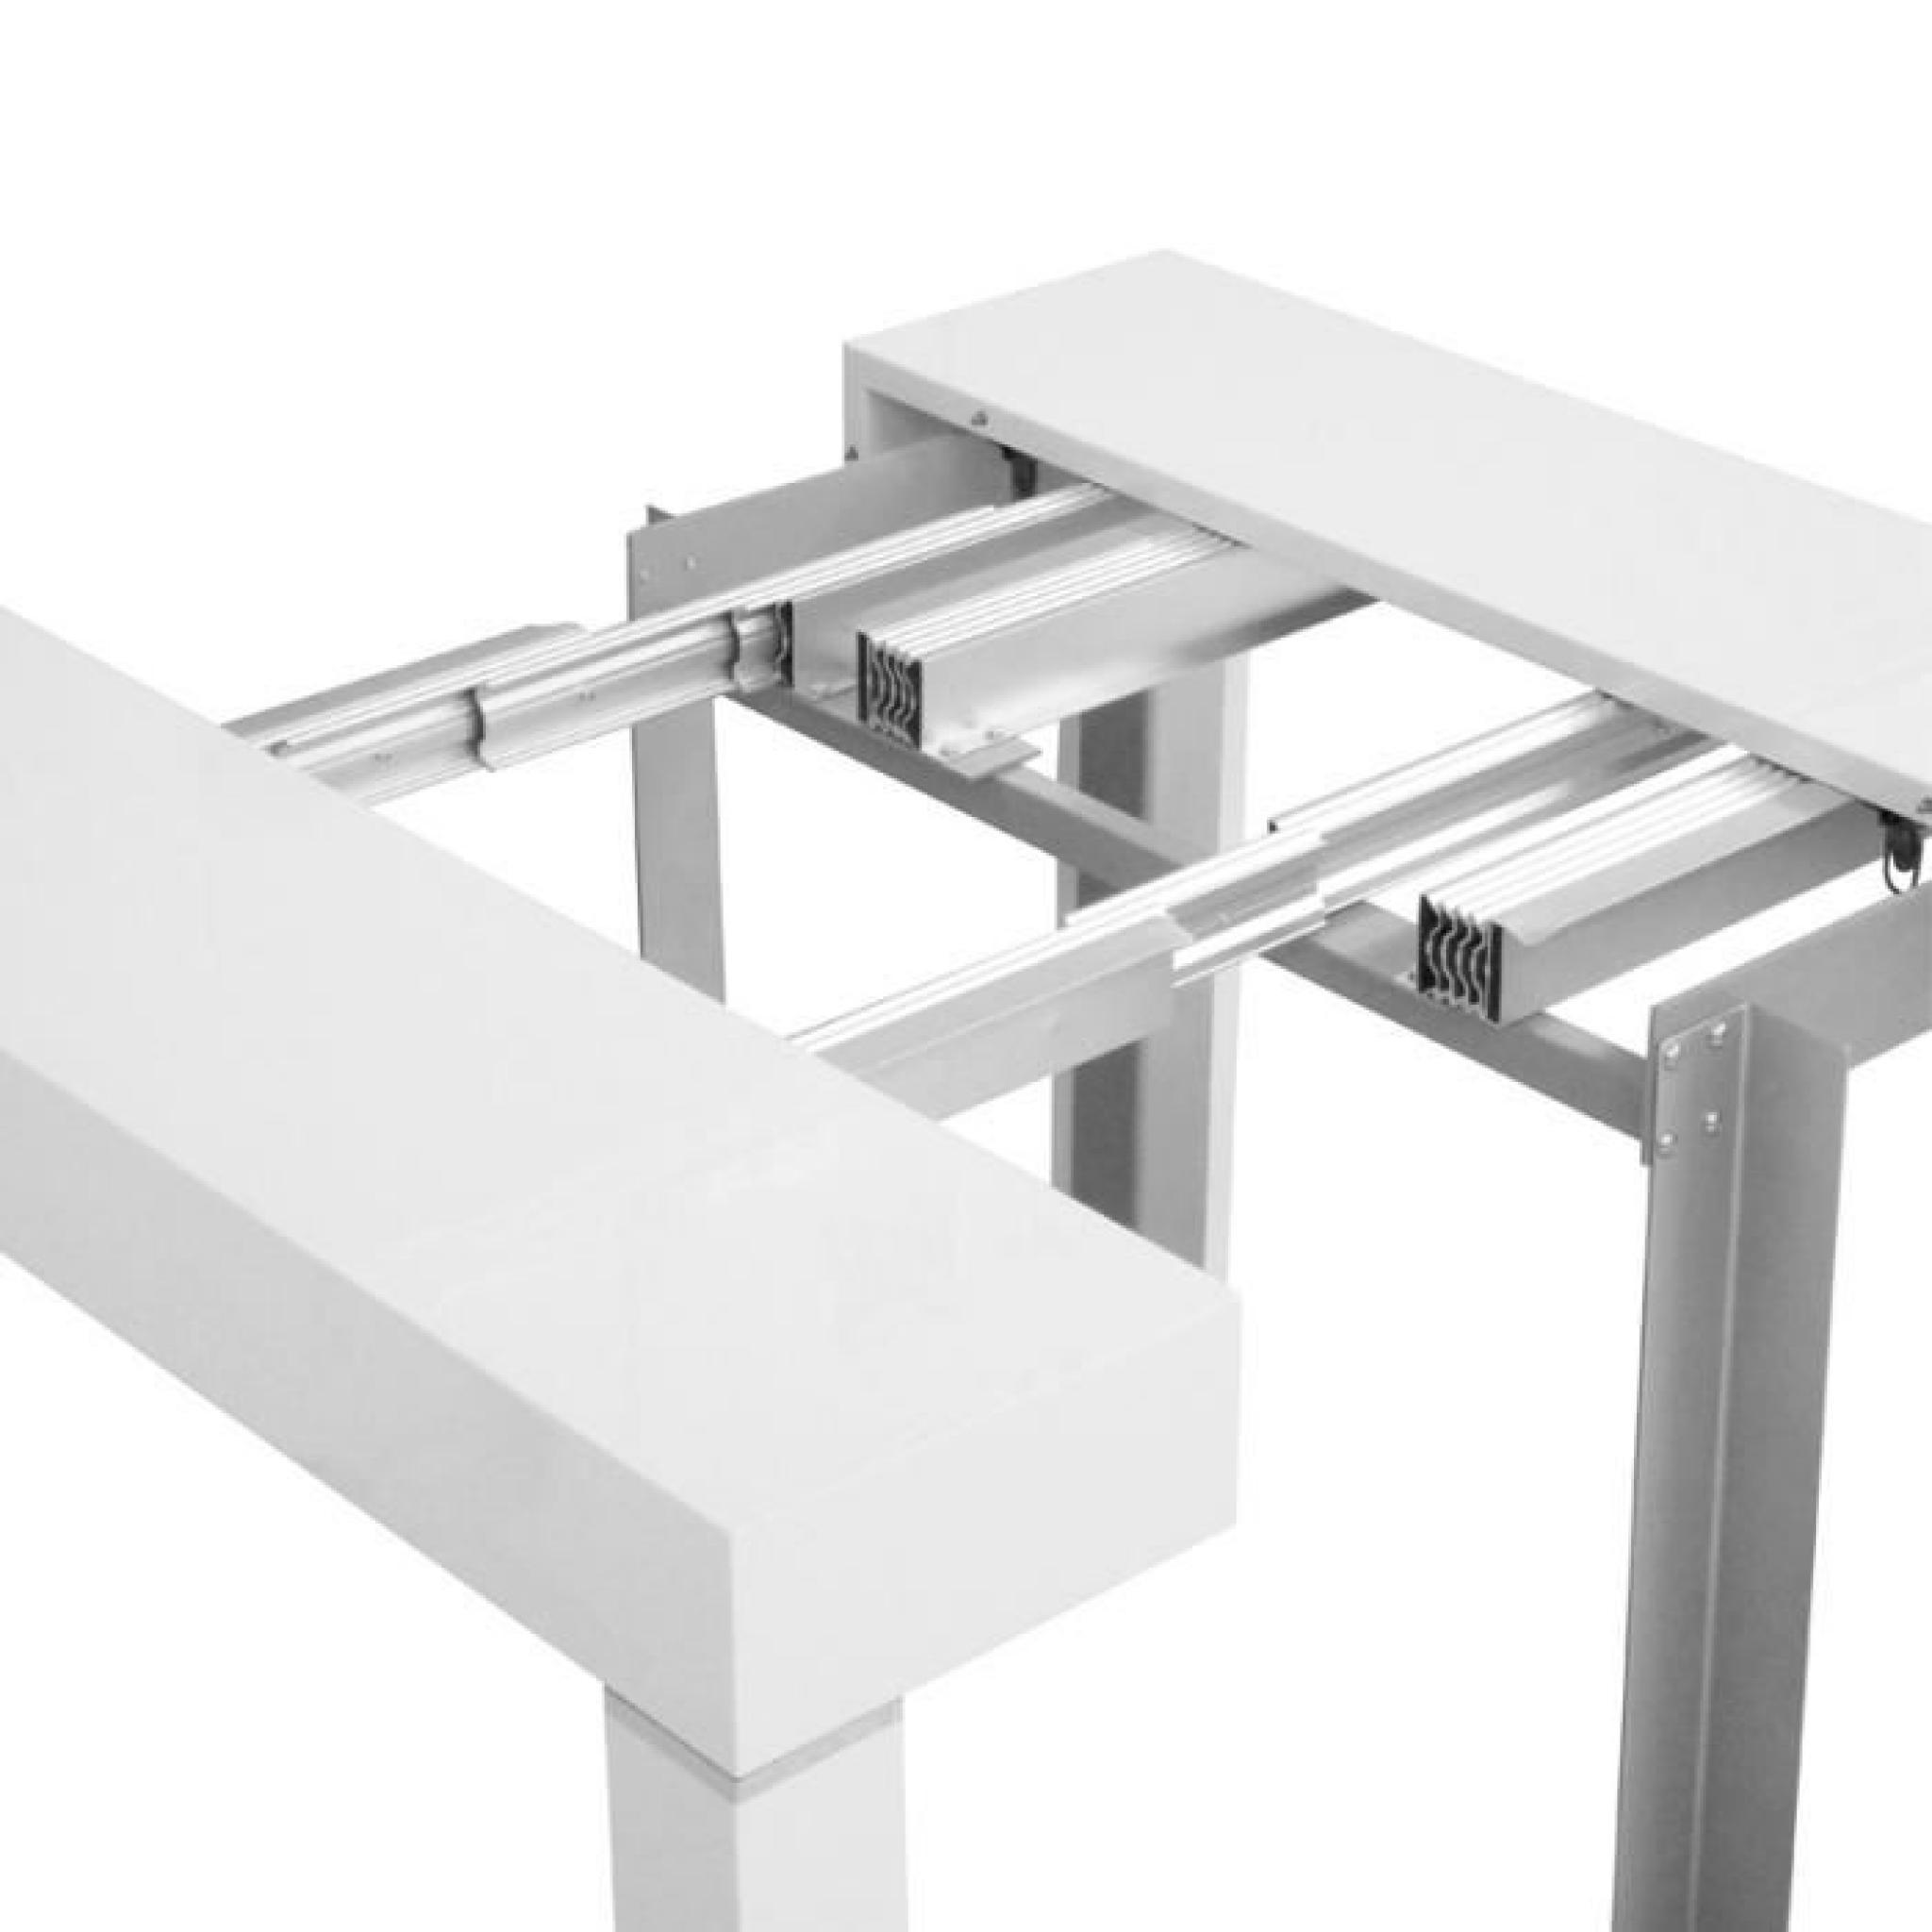 table console laqu e blanc extensible 10 personnes achat. Black Bedroom Furniture Sets. Home Design Ideas